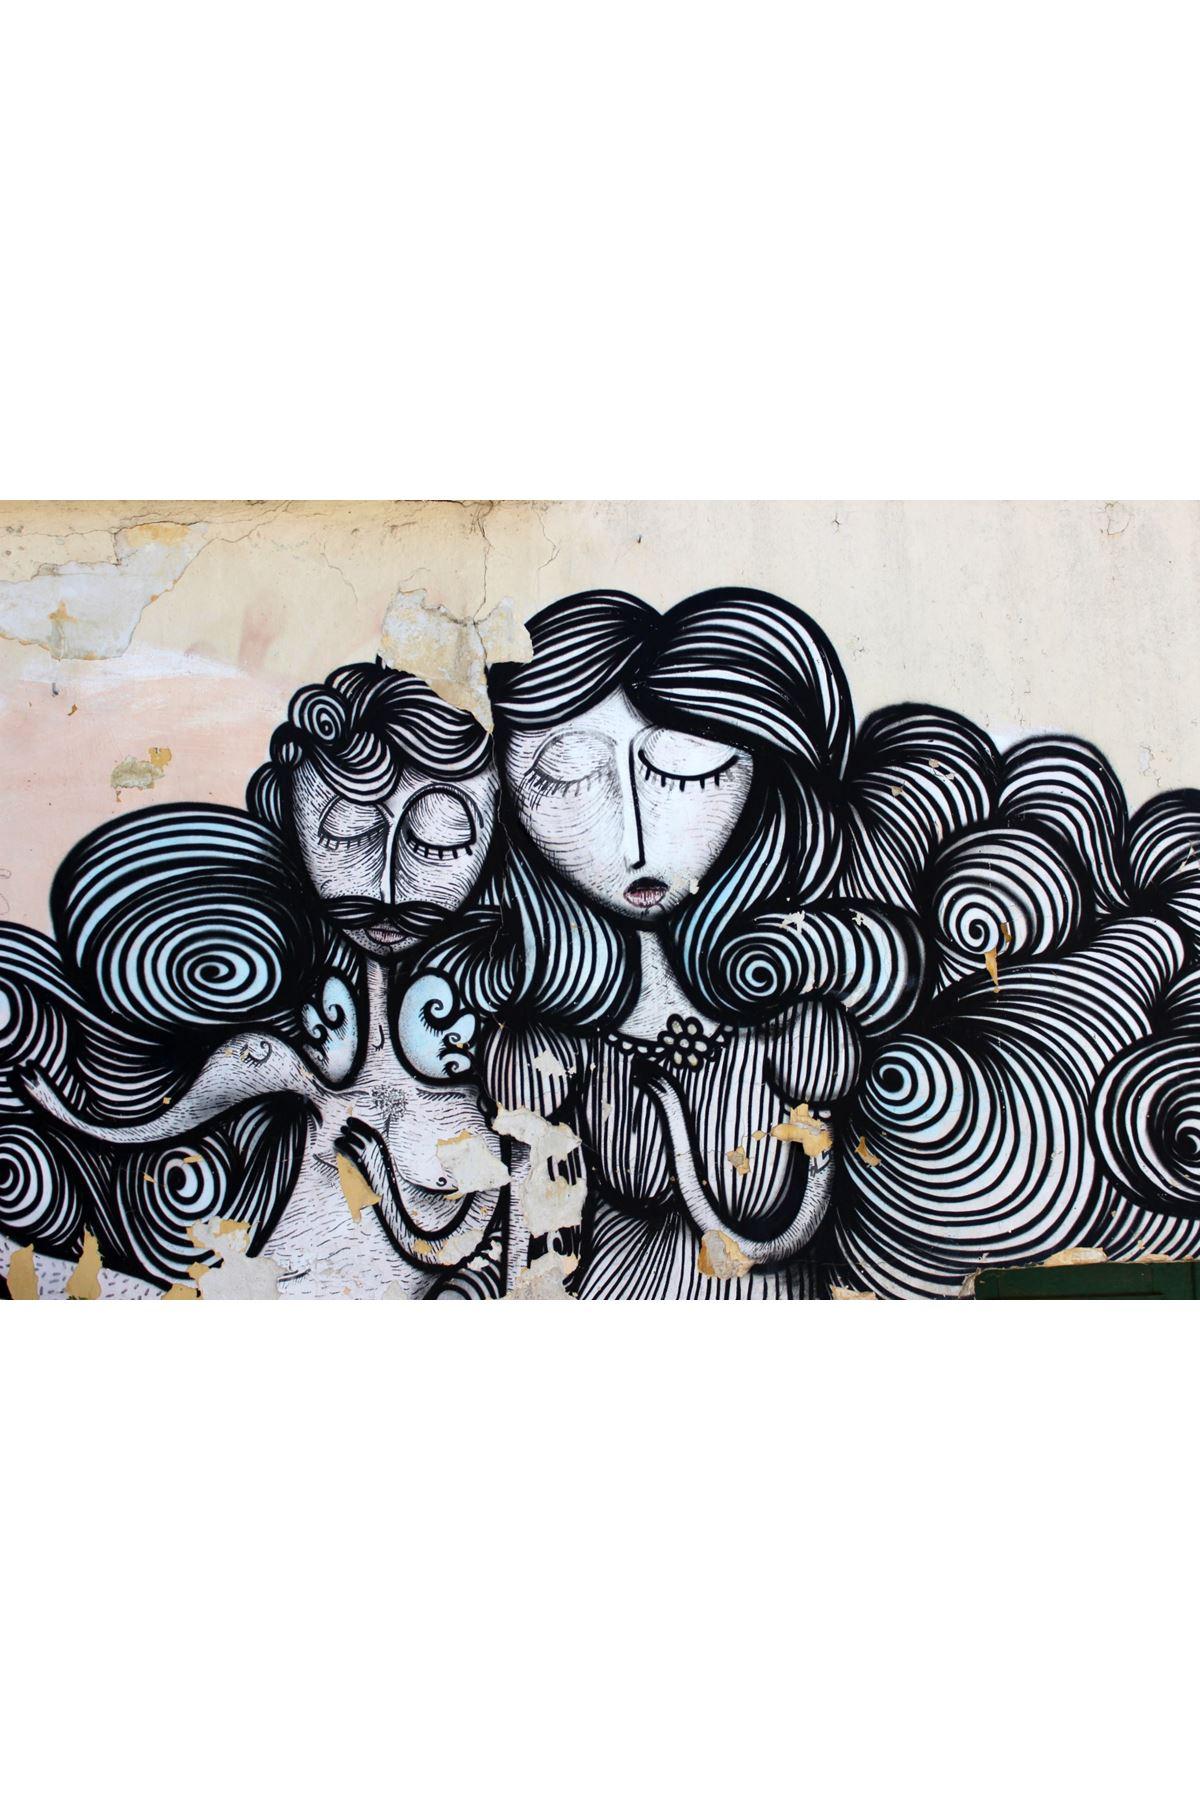 Soyut Graffiti Kanvas Tablo